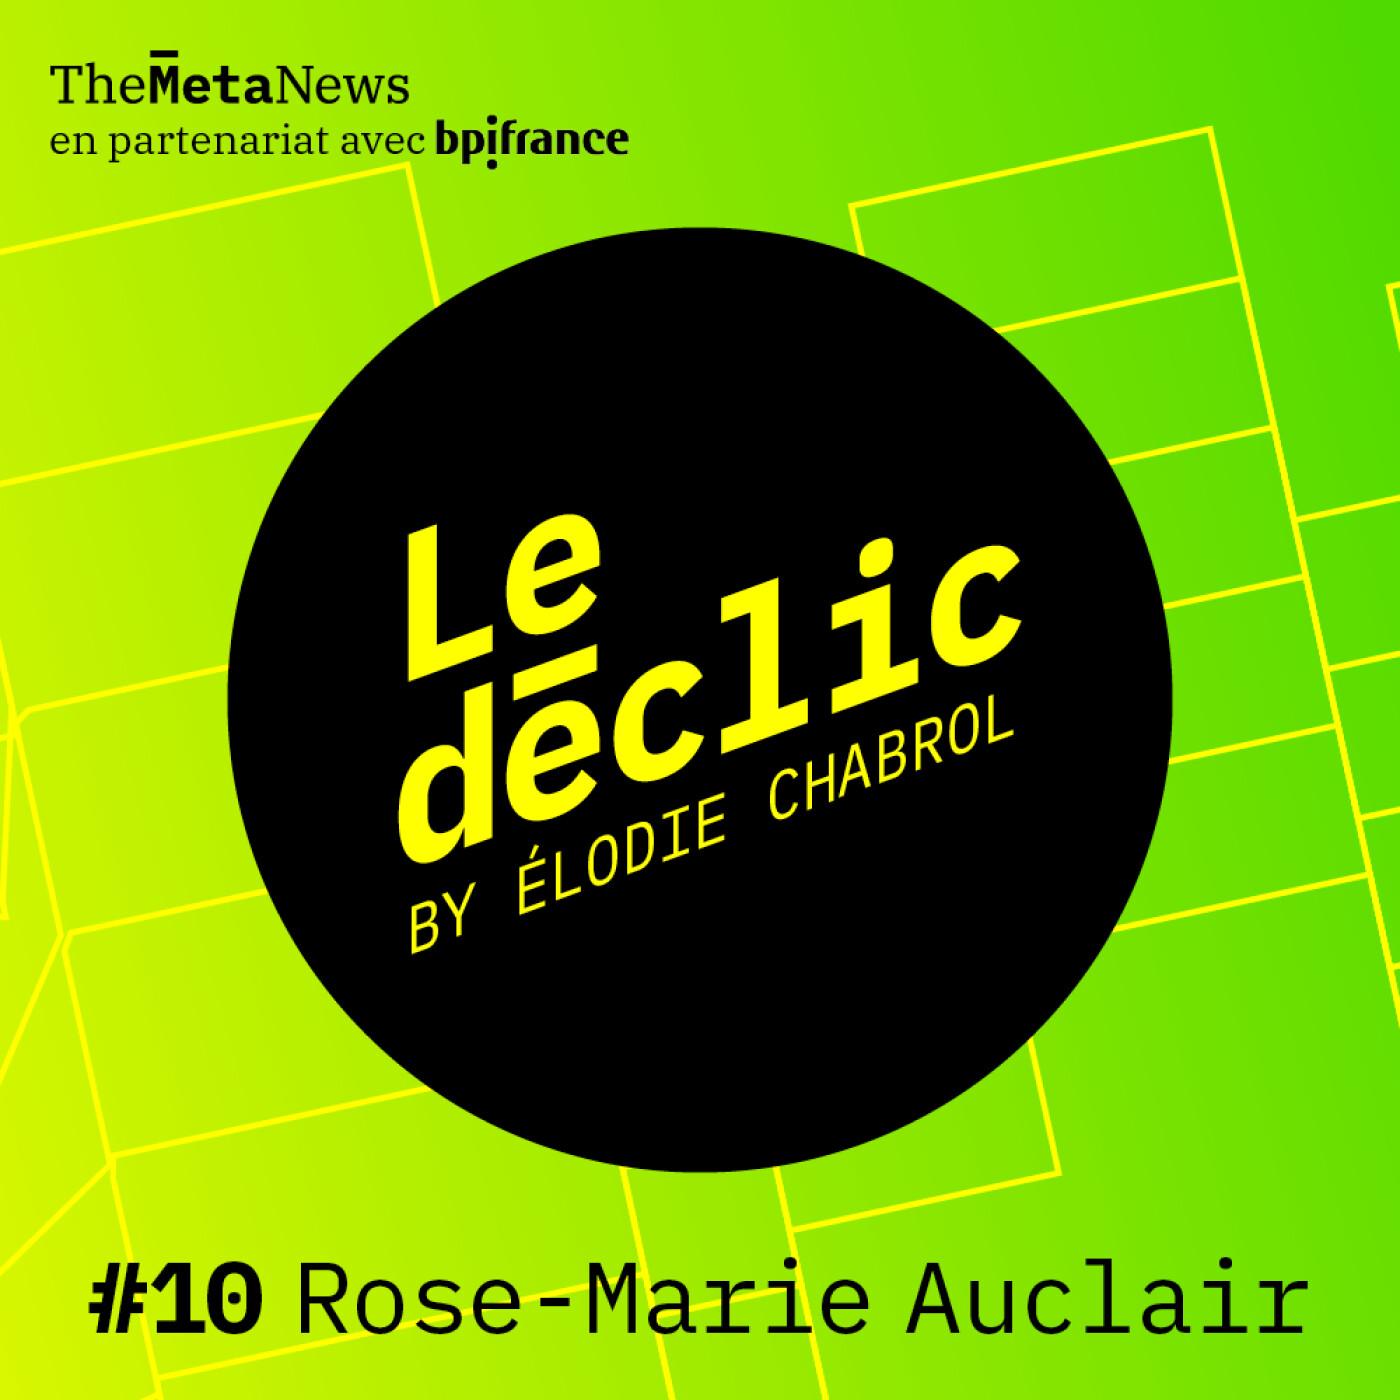 Rose-Marie Auclair, fondatrice de Woodlight